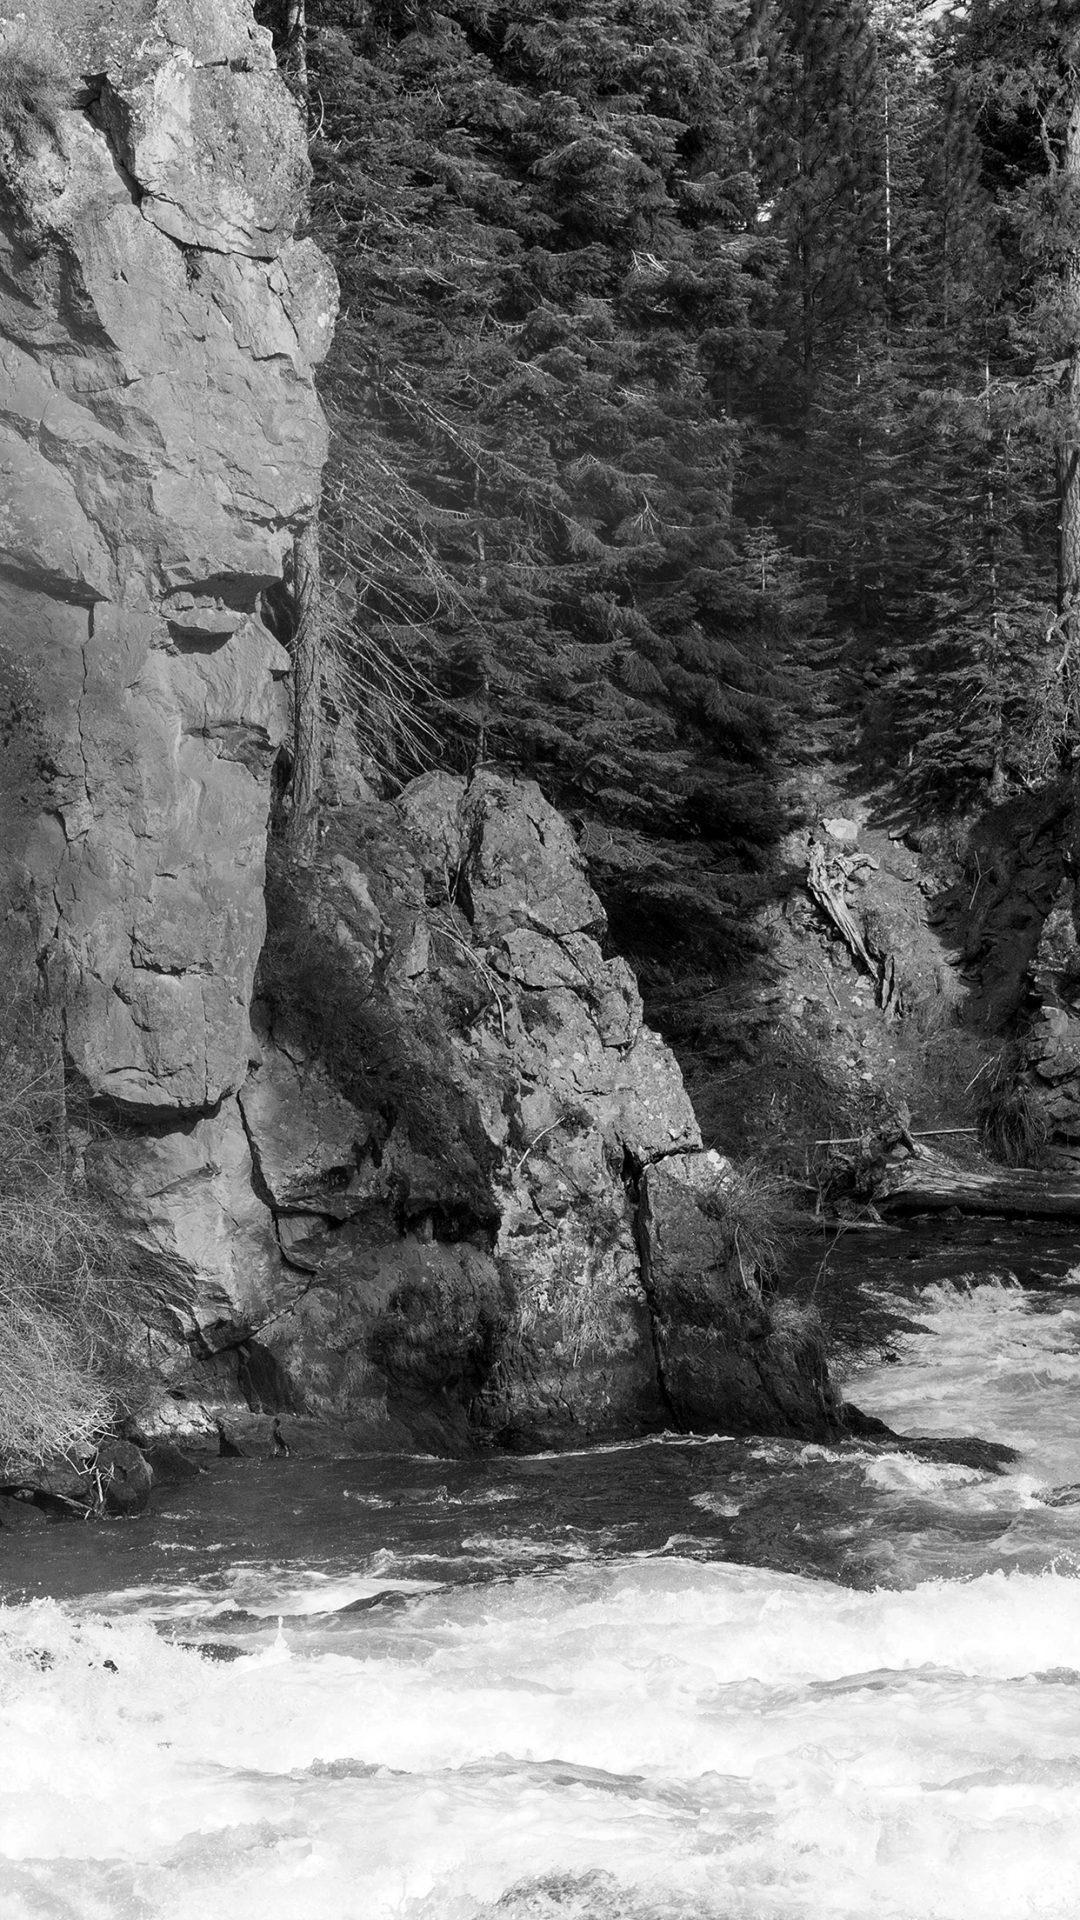 River Mountain Descheutes Nature Dark Bw